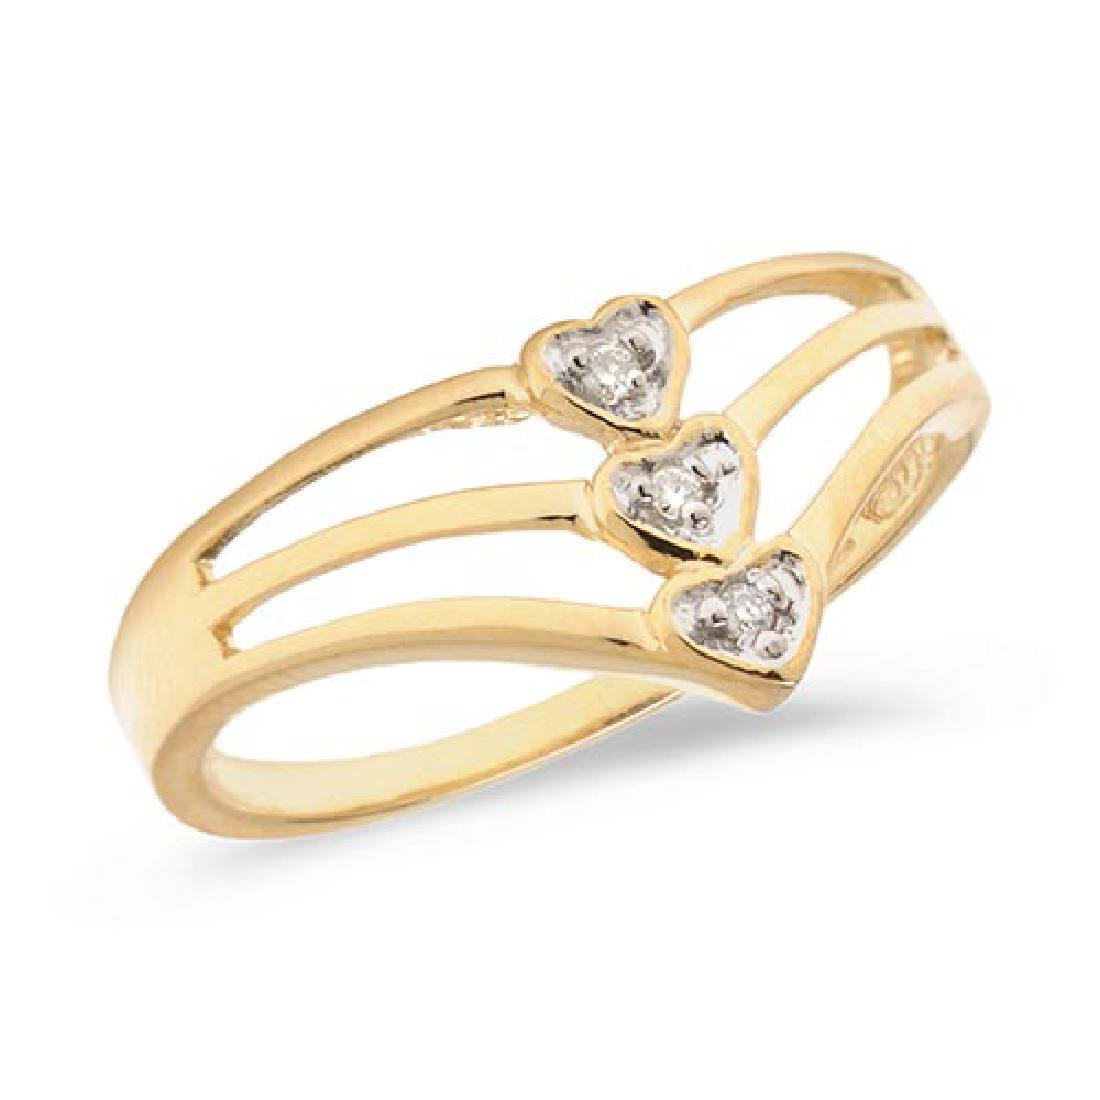 Certified 14K Yellow Gold Diamond Heart Ring